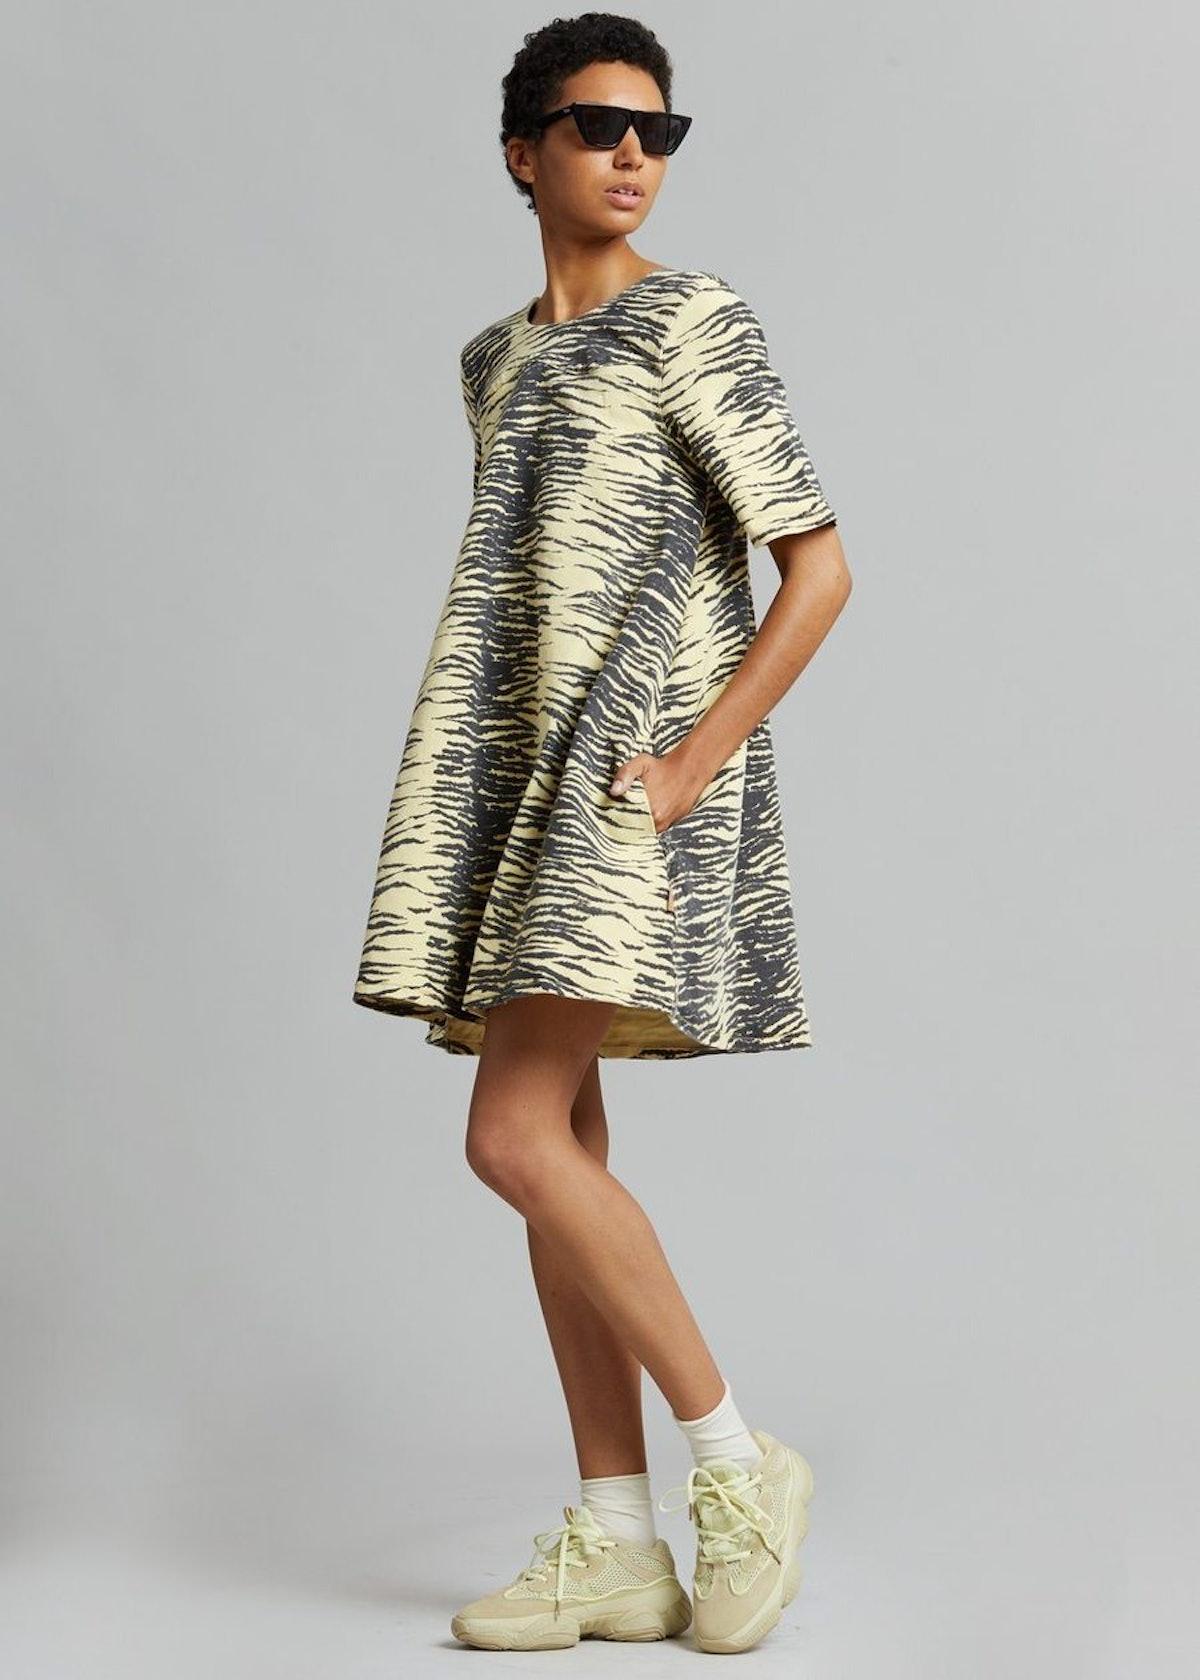 Print Denim Dress in Pale Banana